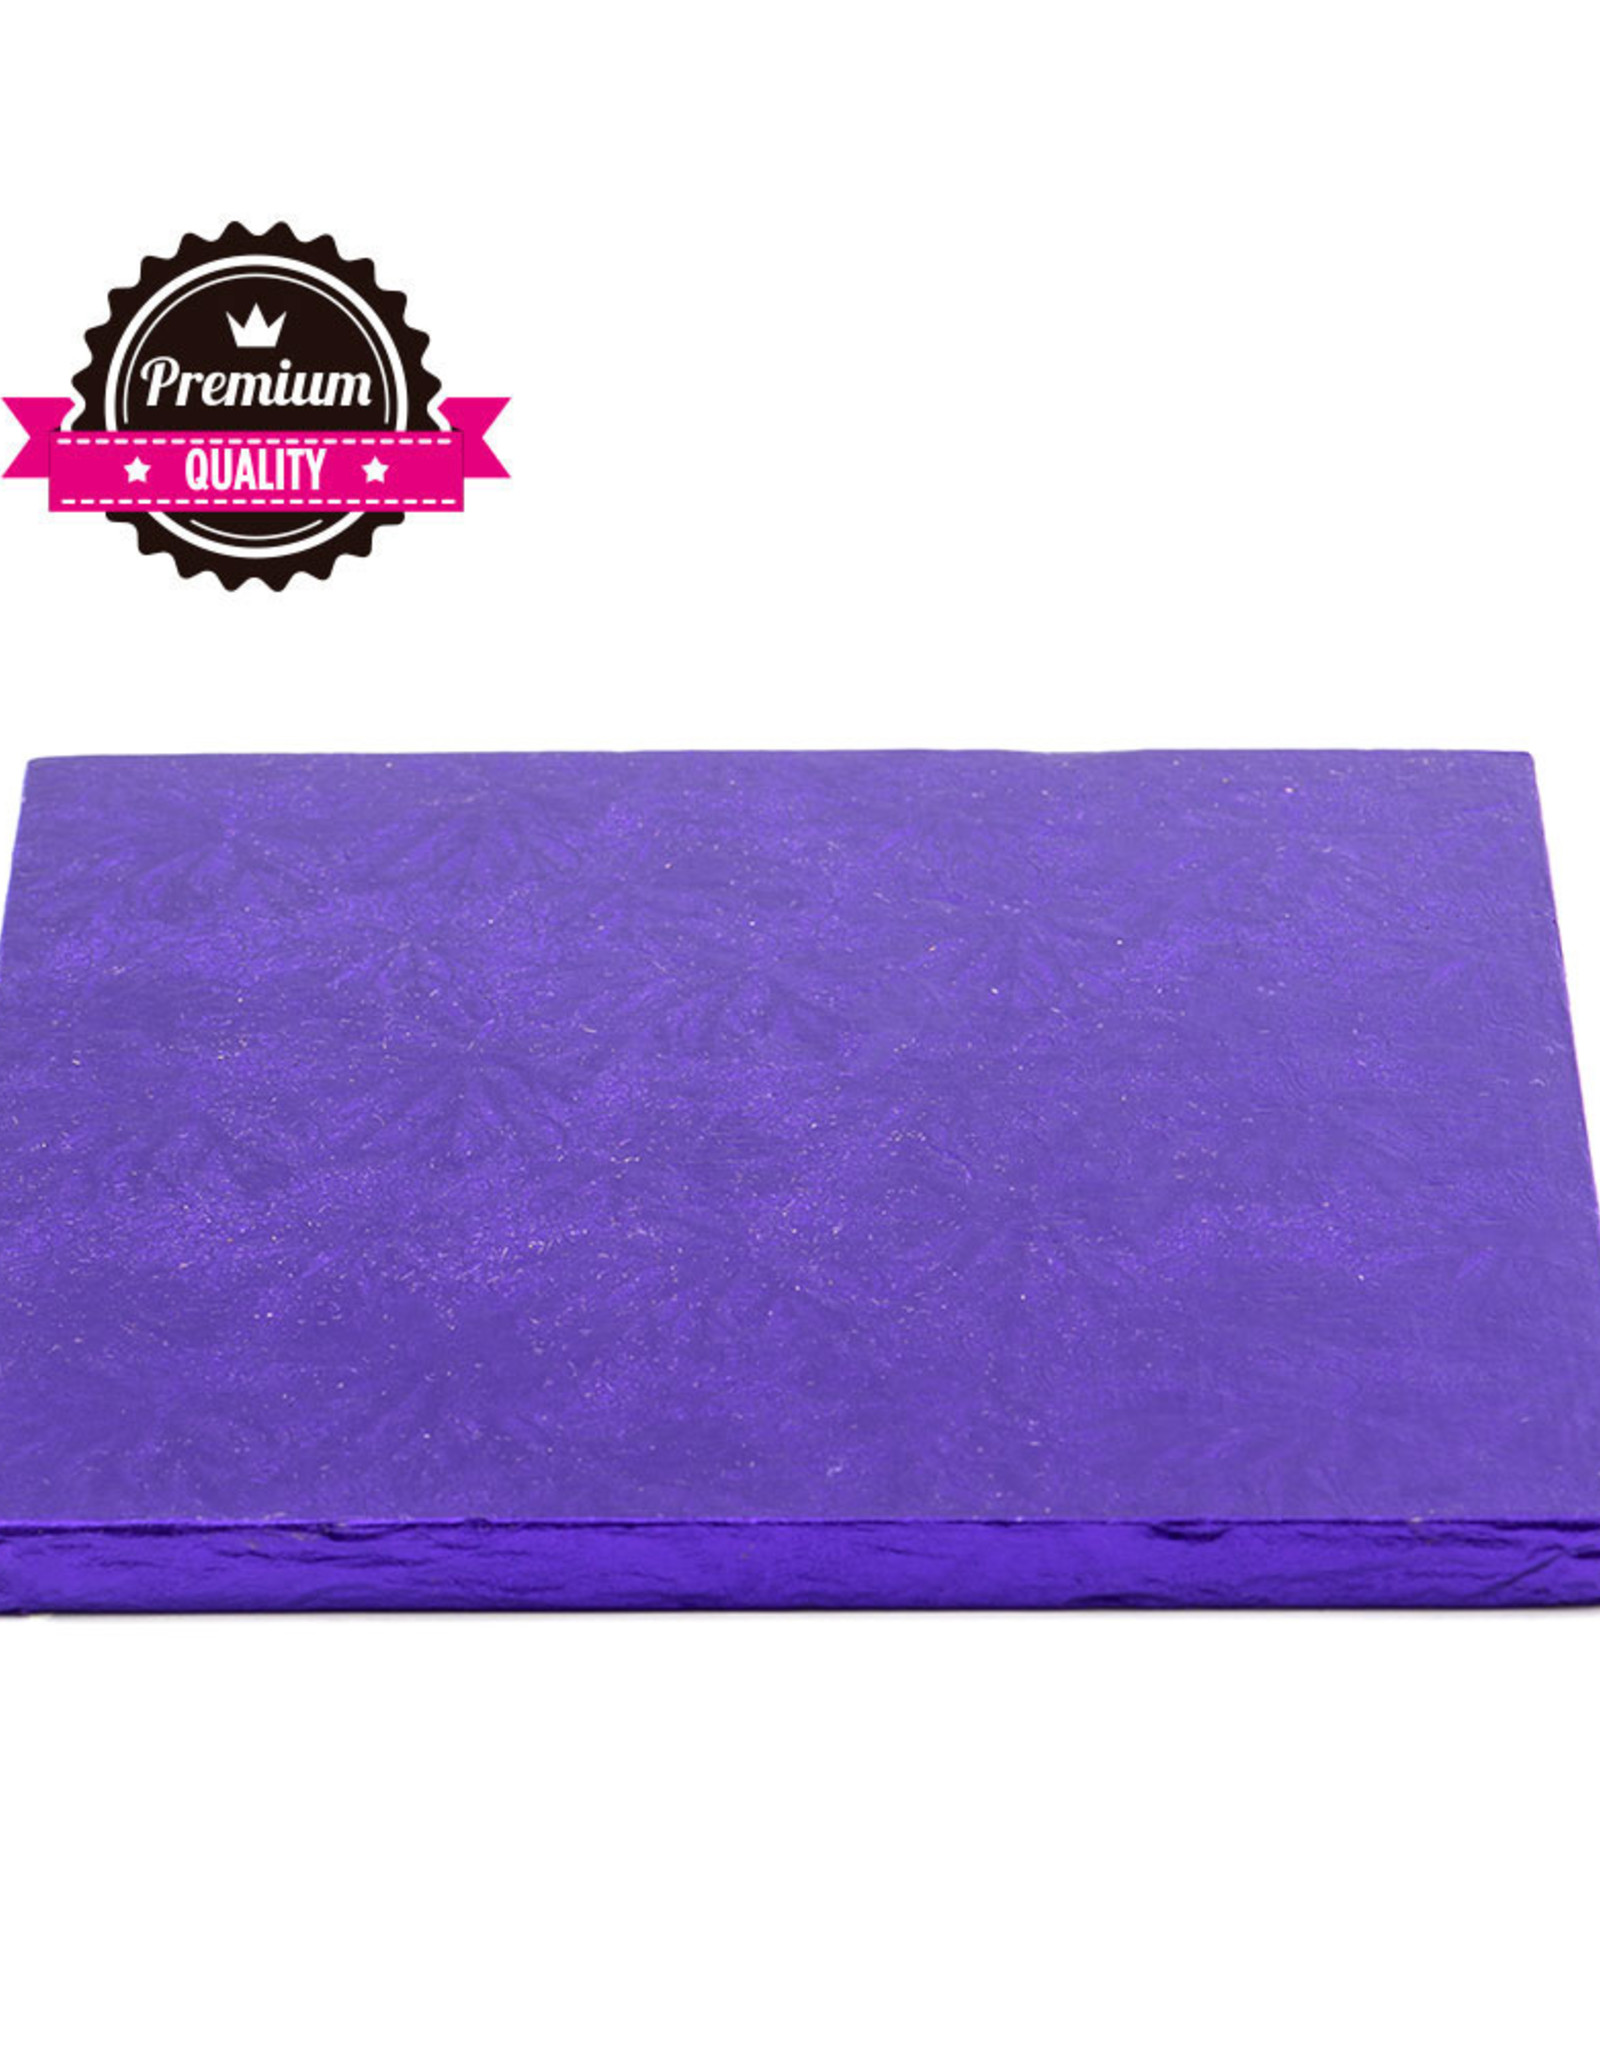 Decora Cake Drum Vierkant 20cm Violet